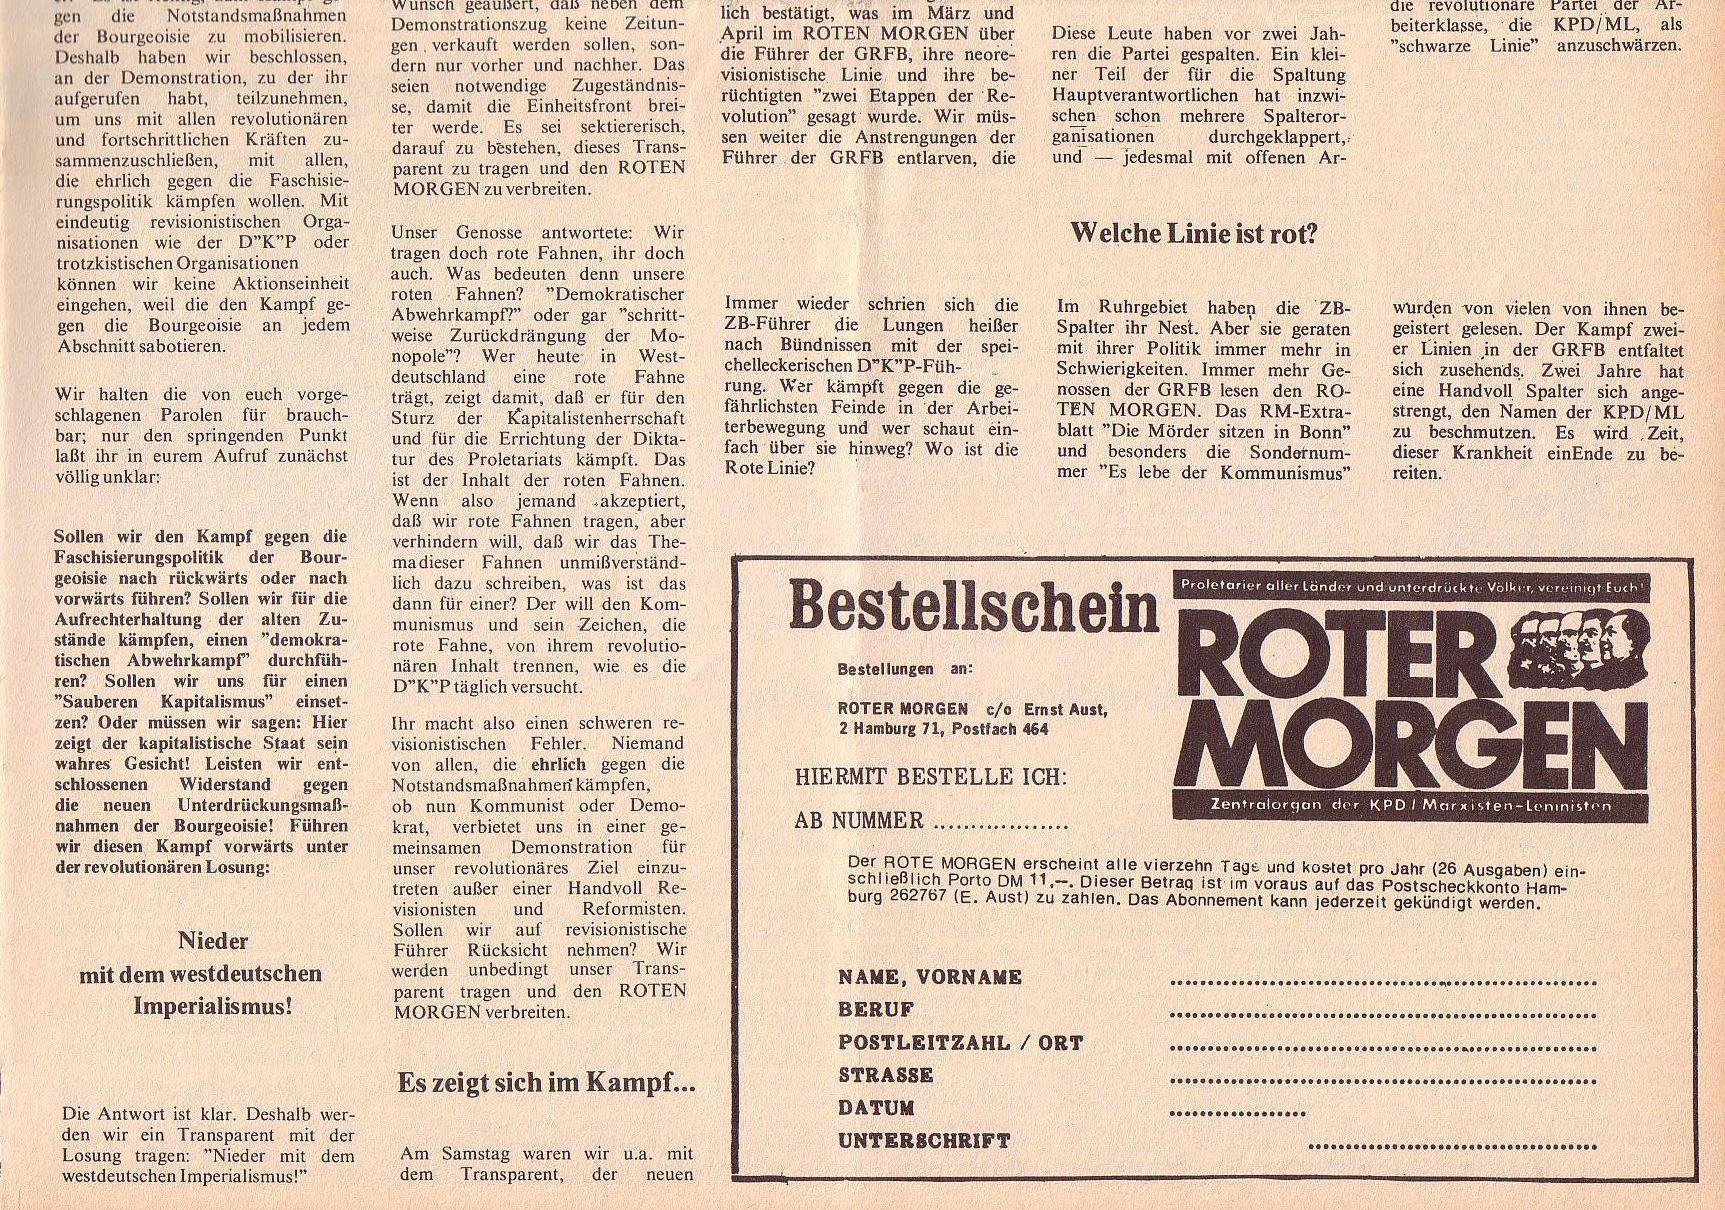 Roter Morgen, 6. Jg., 31. Juli 1972, Nr. 15, Seite 5b